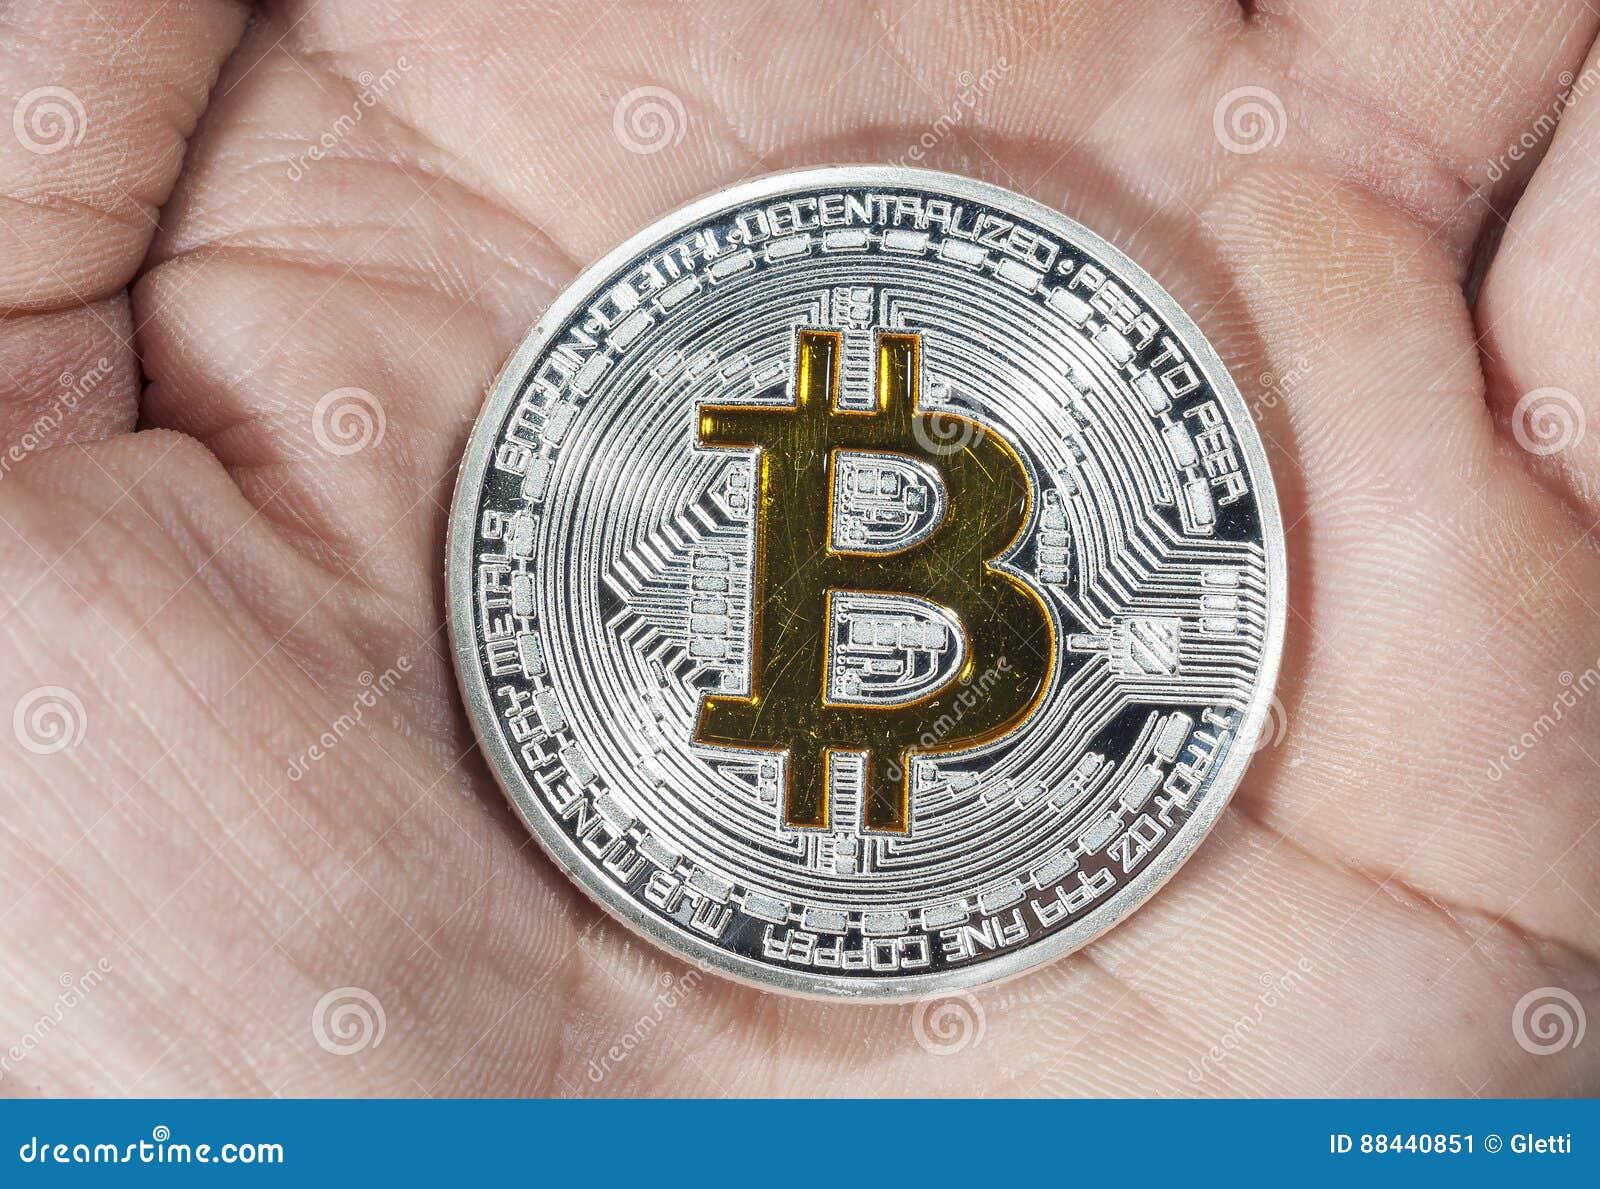 Sola Moneda De BTC Bitcoin A Mano Imagen de archivo - Imagen de ...